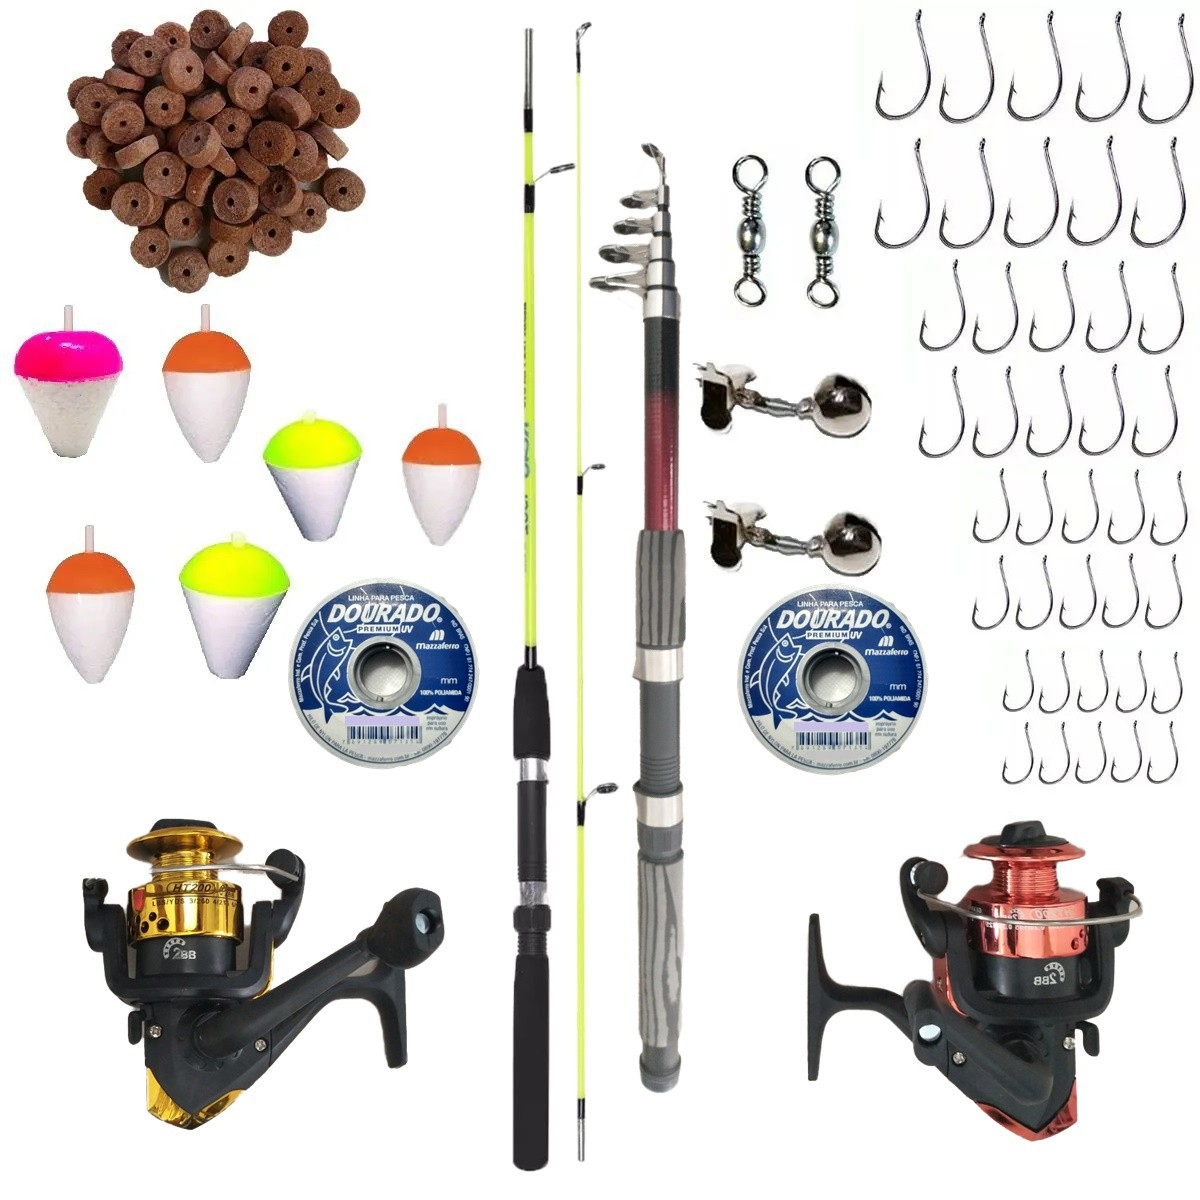 Kit De Pesca Completo Vara 1,20m E 2,10m 2 Molinete E Itens